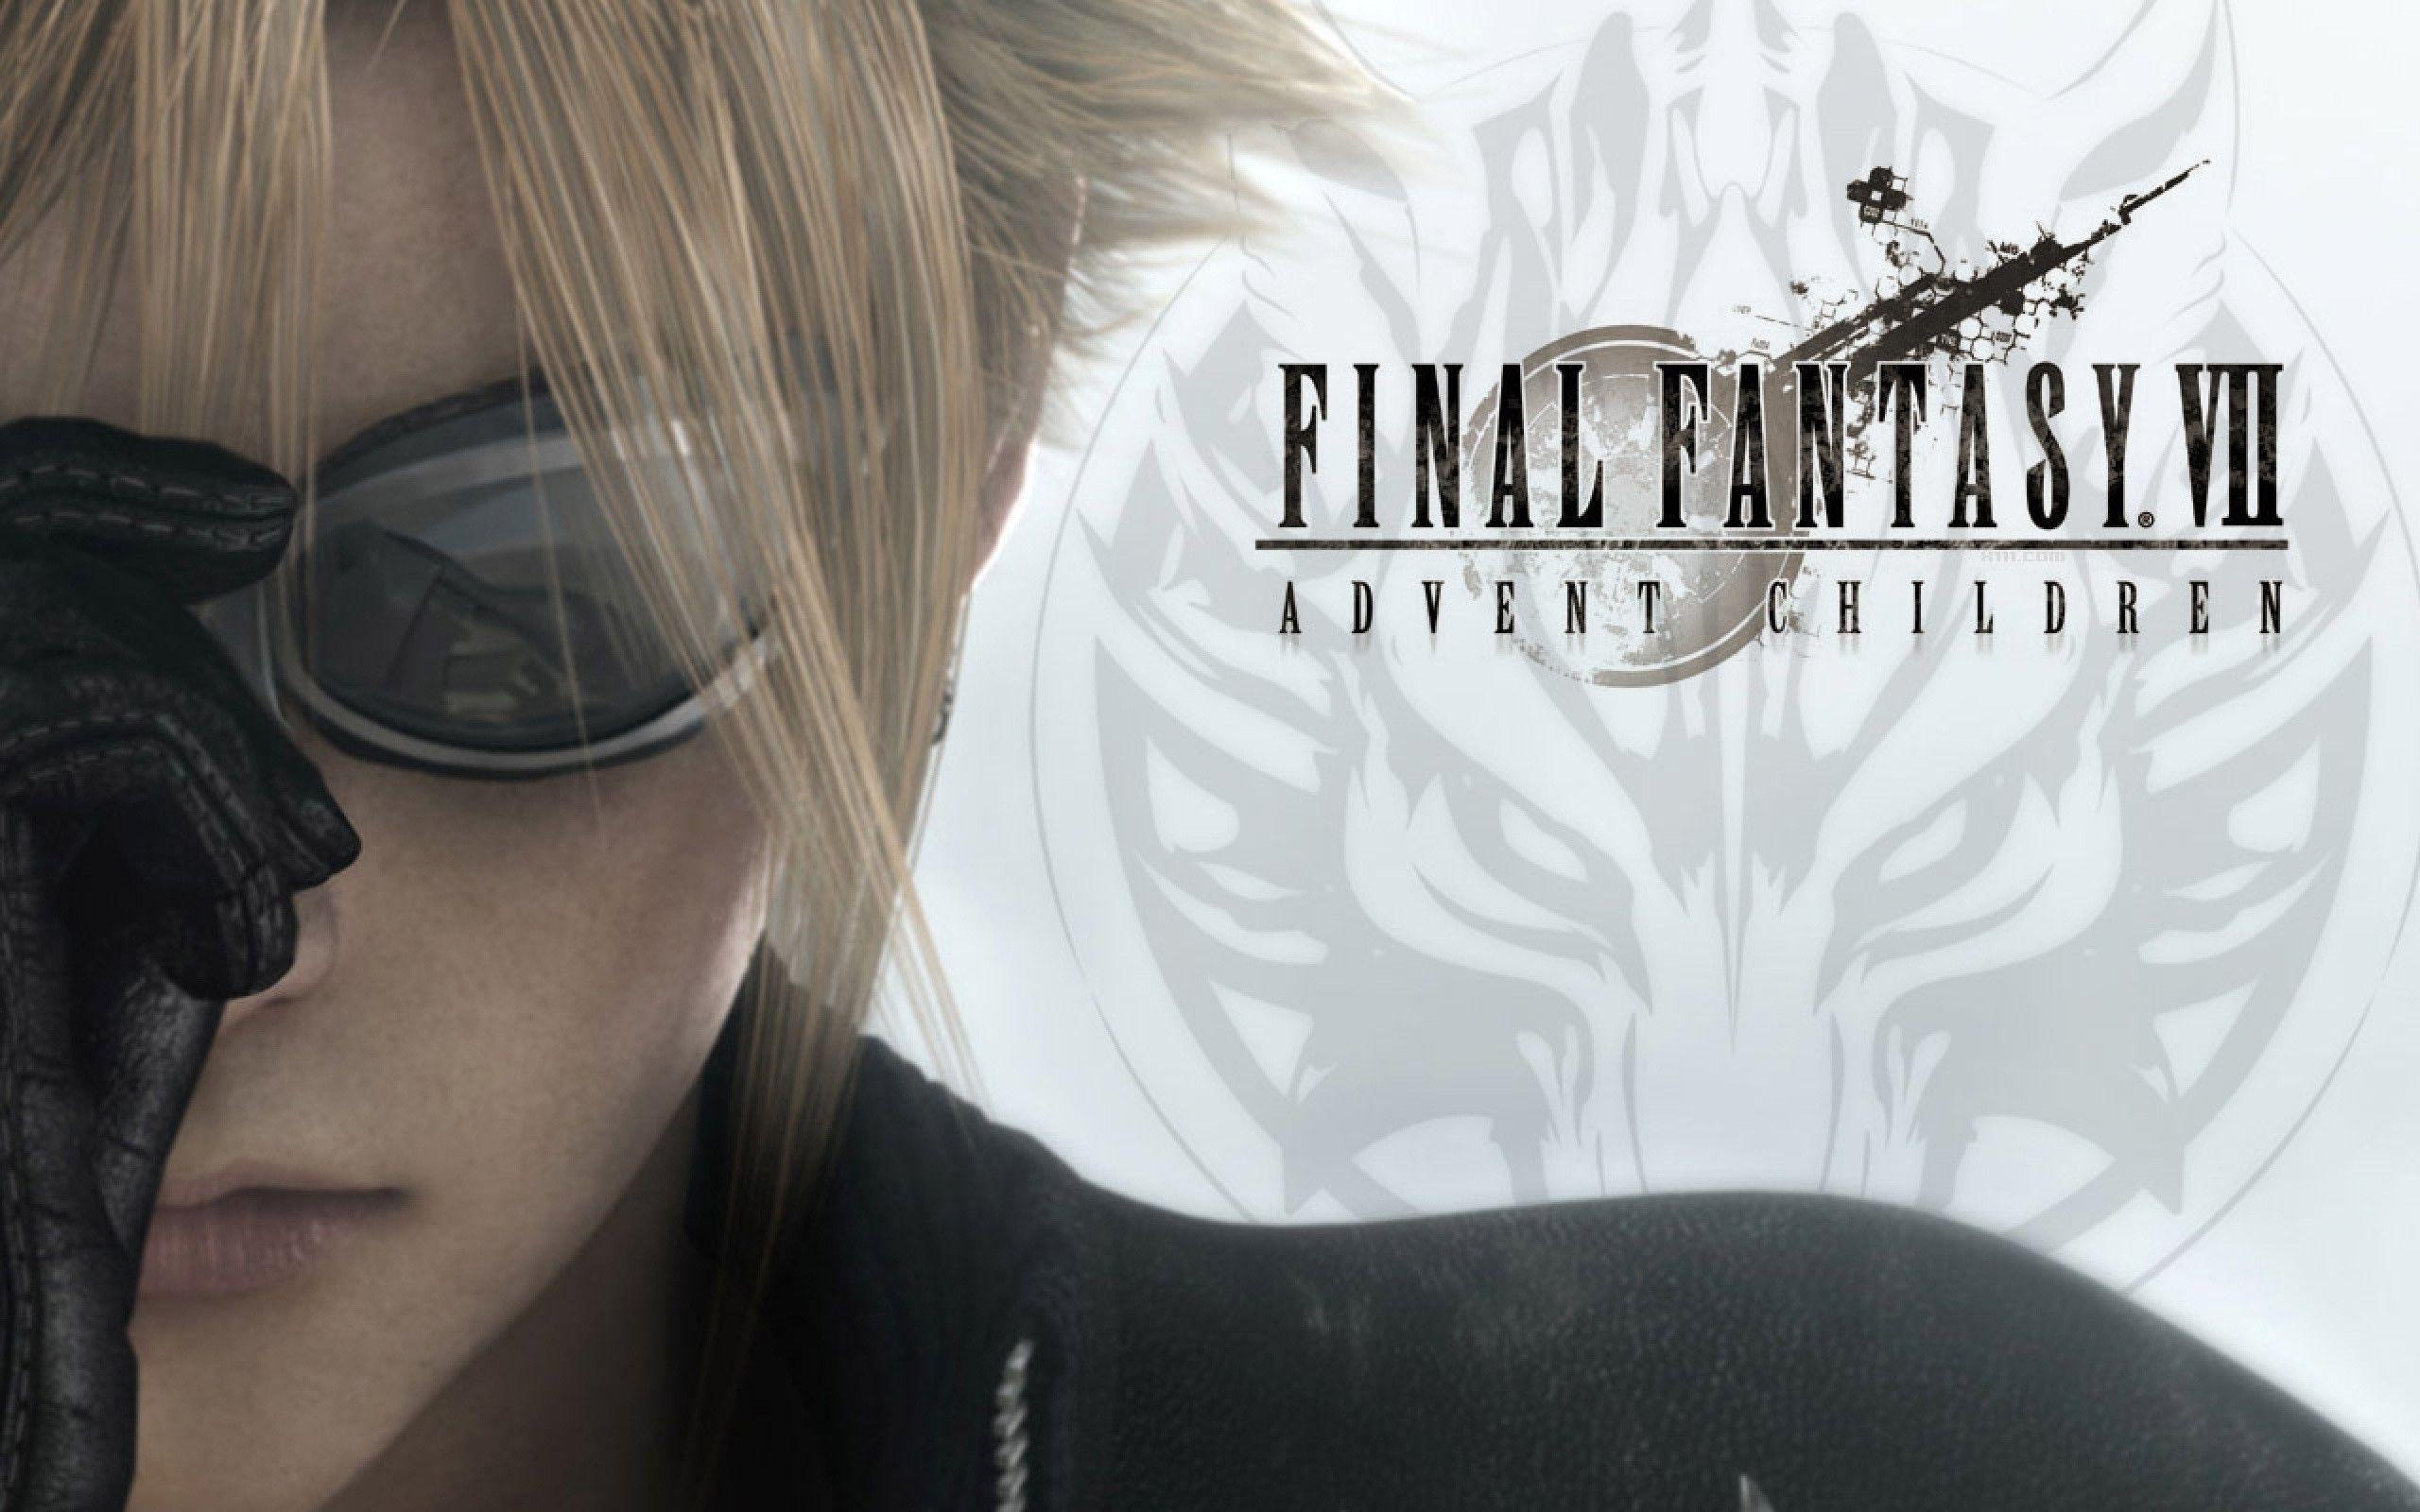 Final Fantasy vii Advent Children hd Wallpaper | HD Wallpapers .